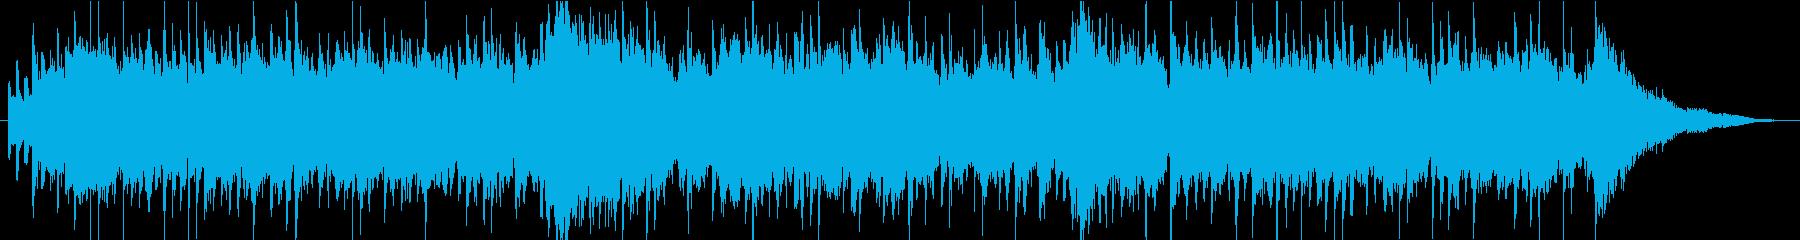 Calm Japanese Songの再生済みの波形